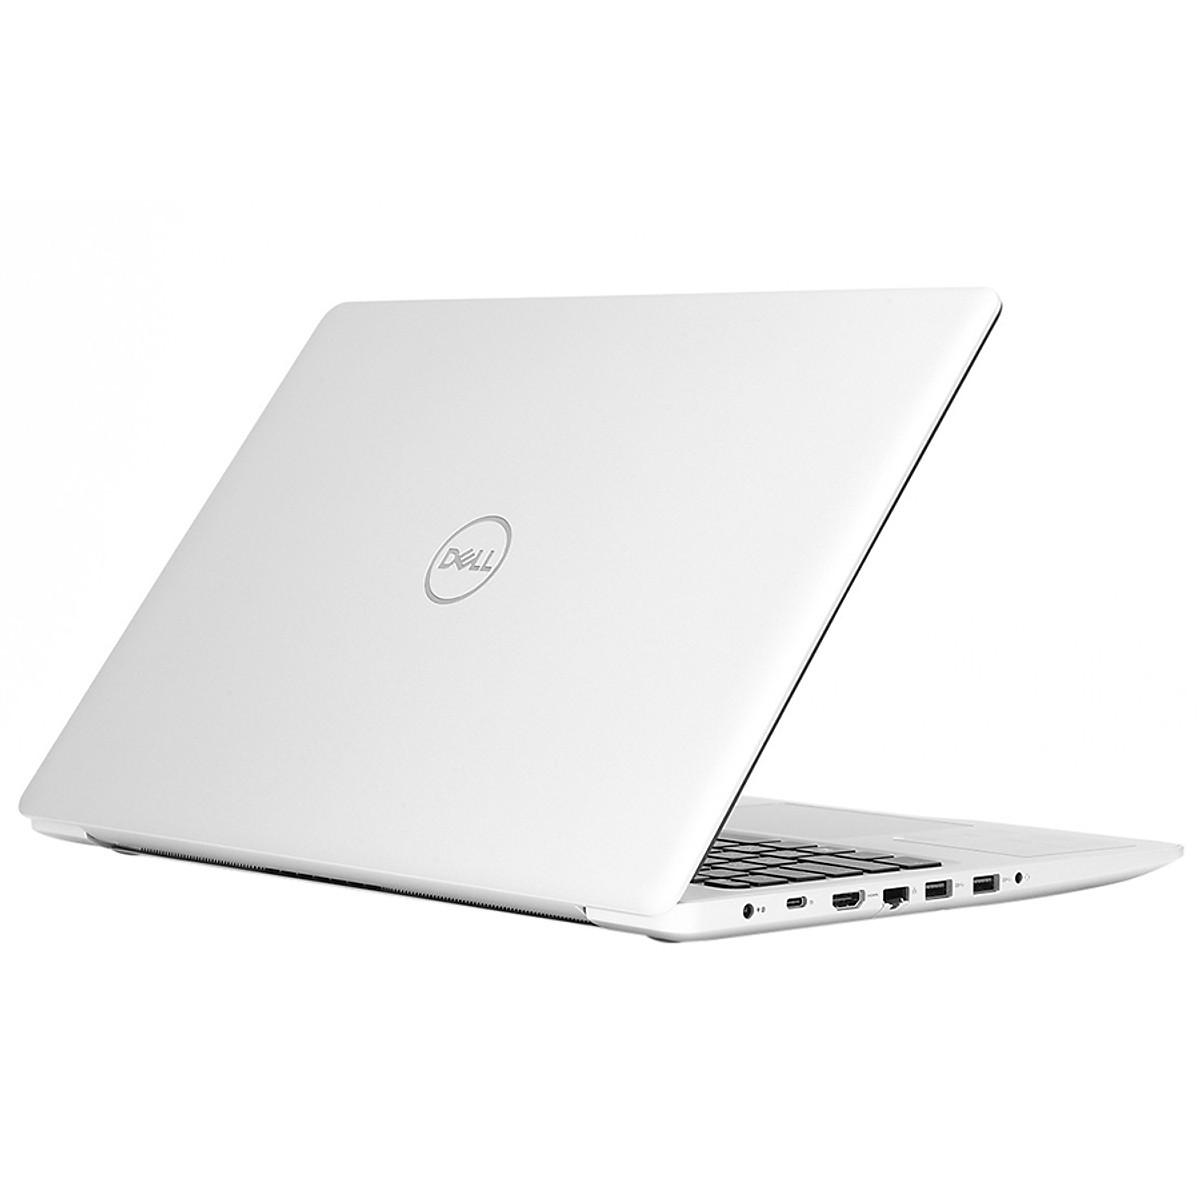 laptop dell core i5 inspiron 15 5570